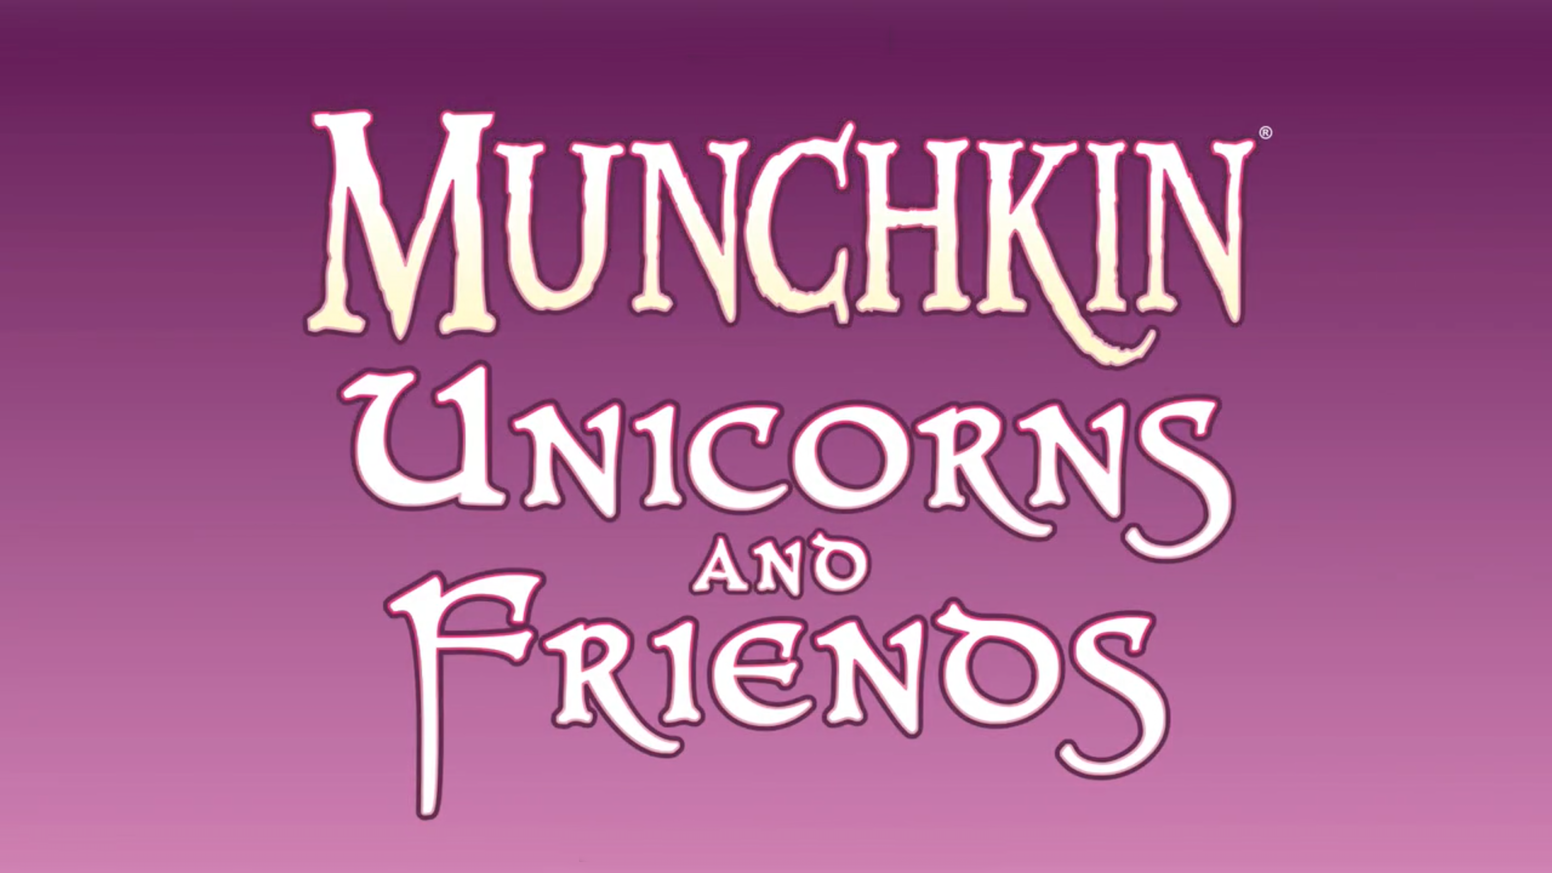 7ffced6f5e Munchkin Unicorns and Friends, a Munchkin mini-expansion loaded with  unicorns, cows,